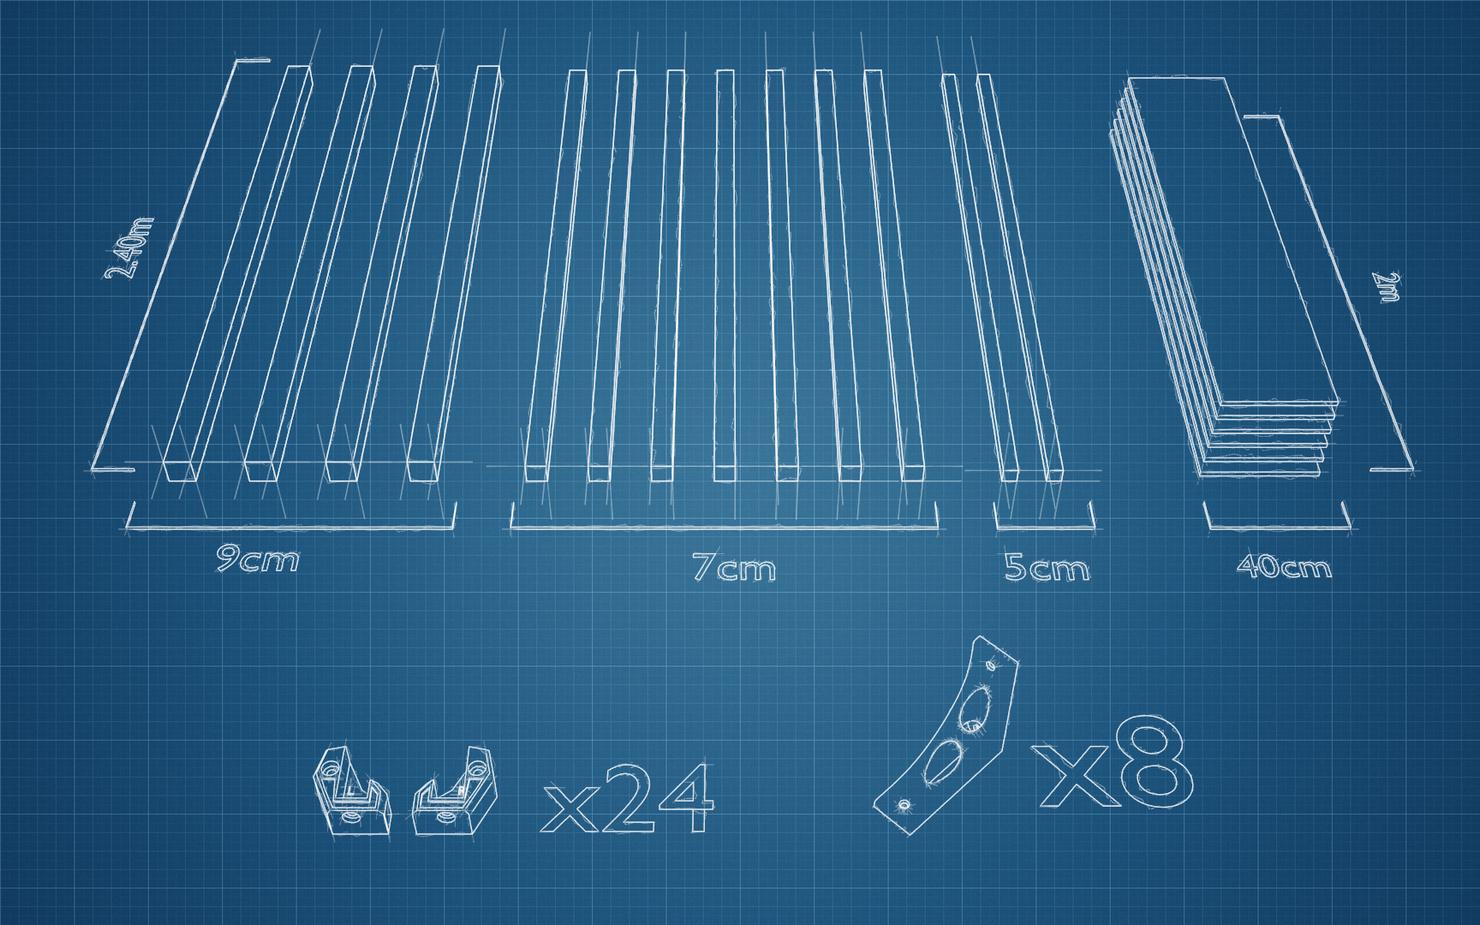 blueprint_material3.png Download free STL file PERGOLA - wood and 3d printing • 3D printer model, Julien_DaCosta